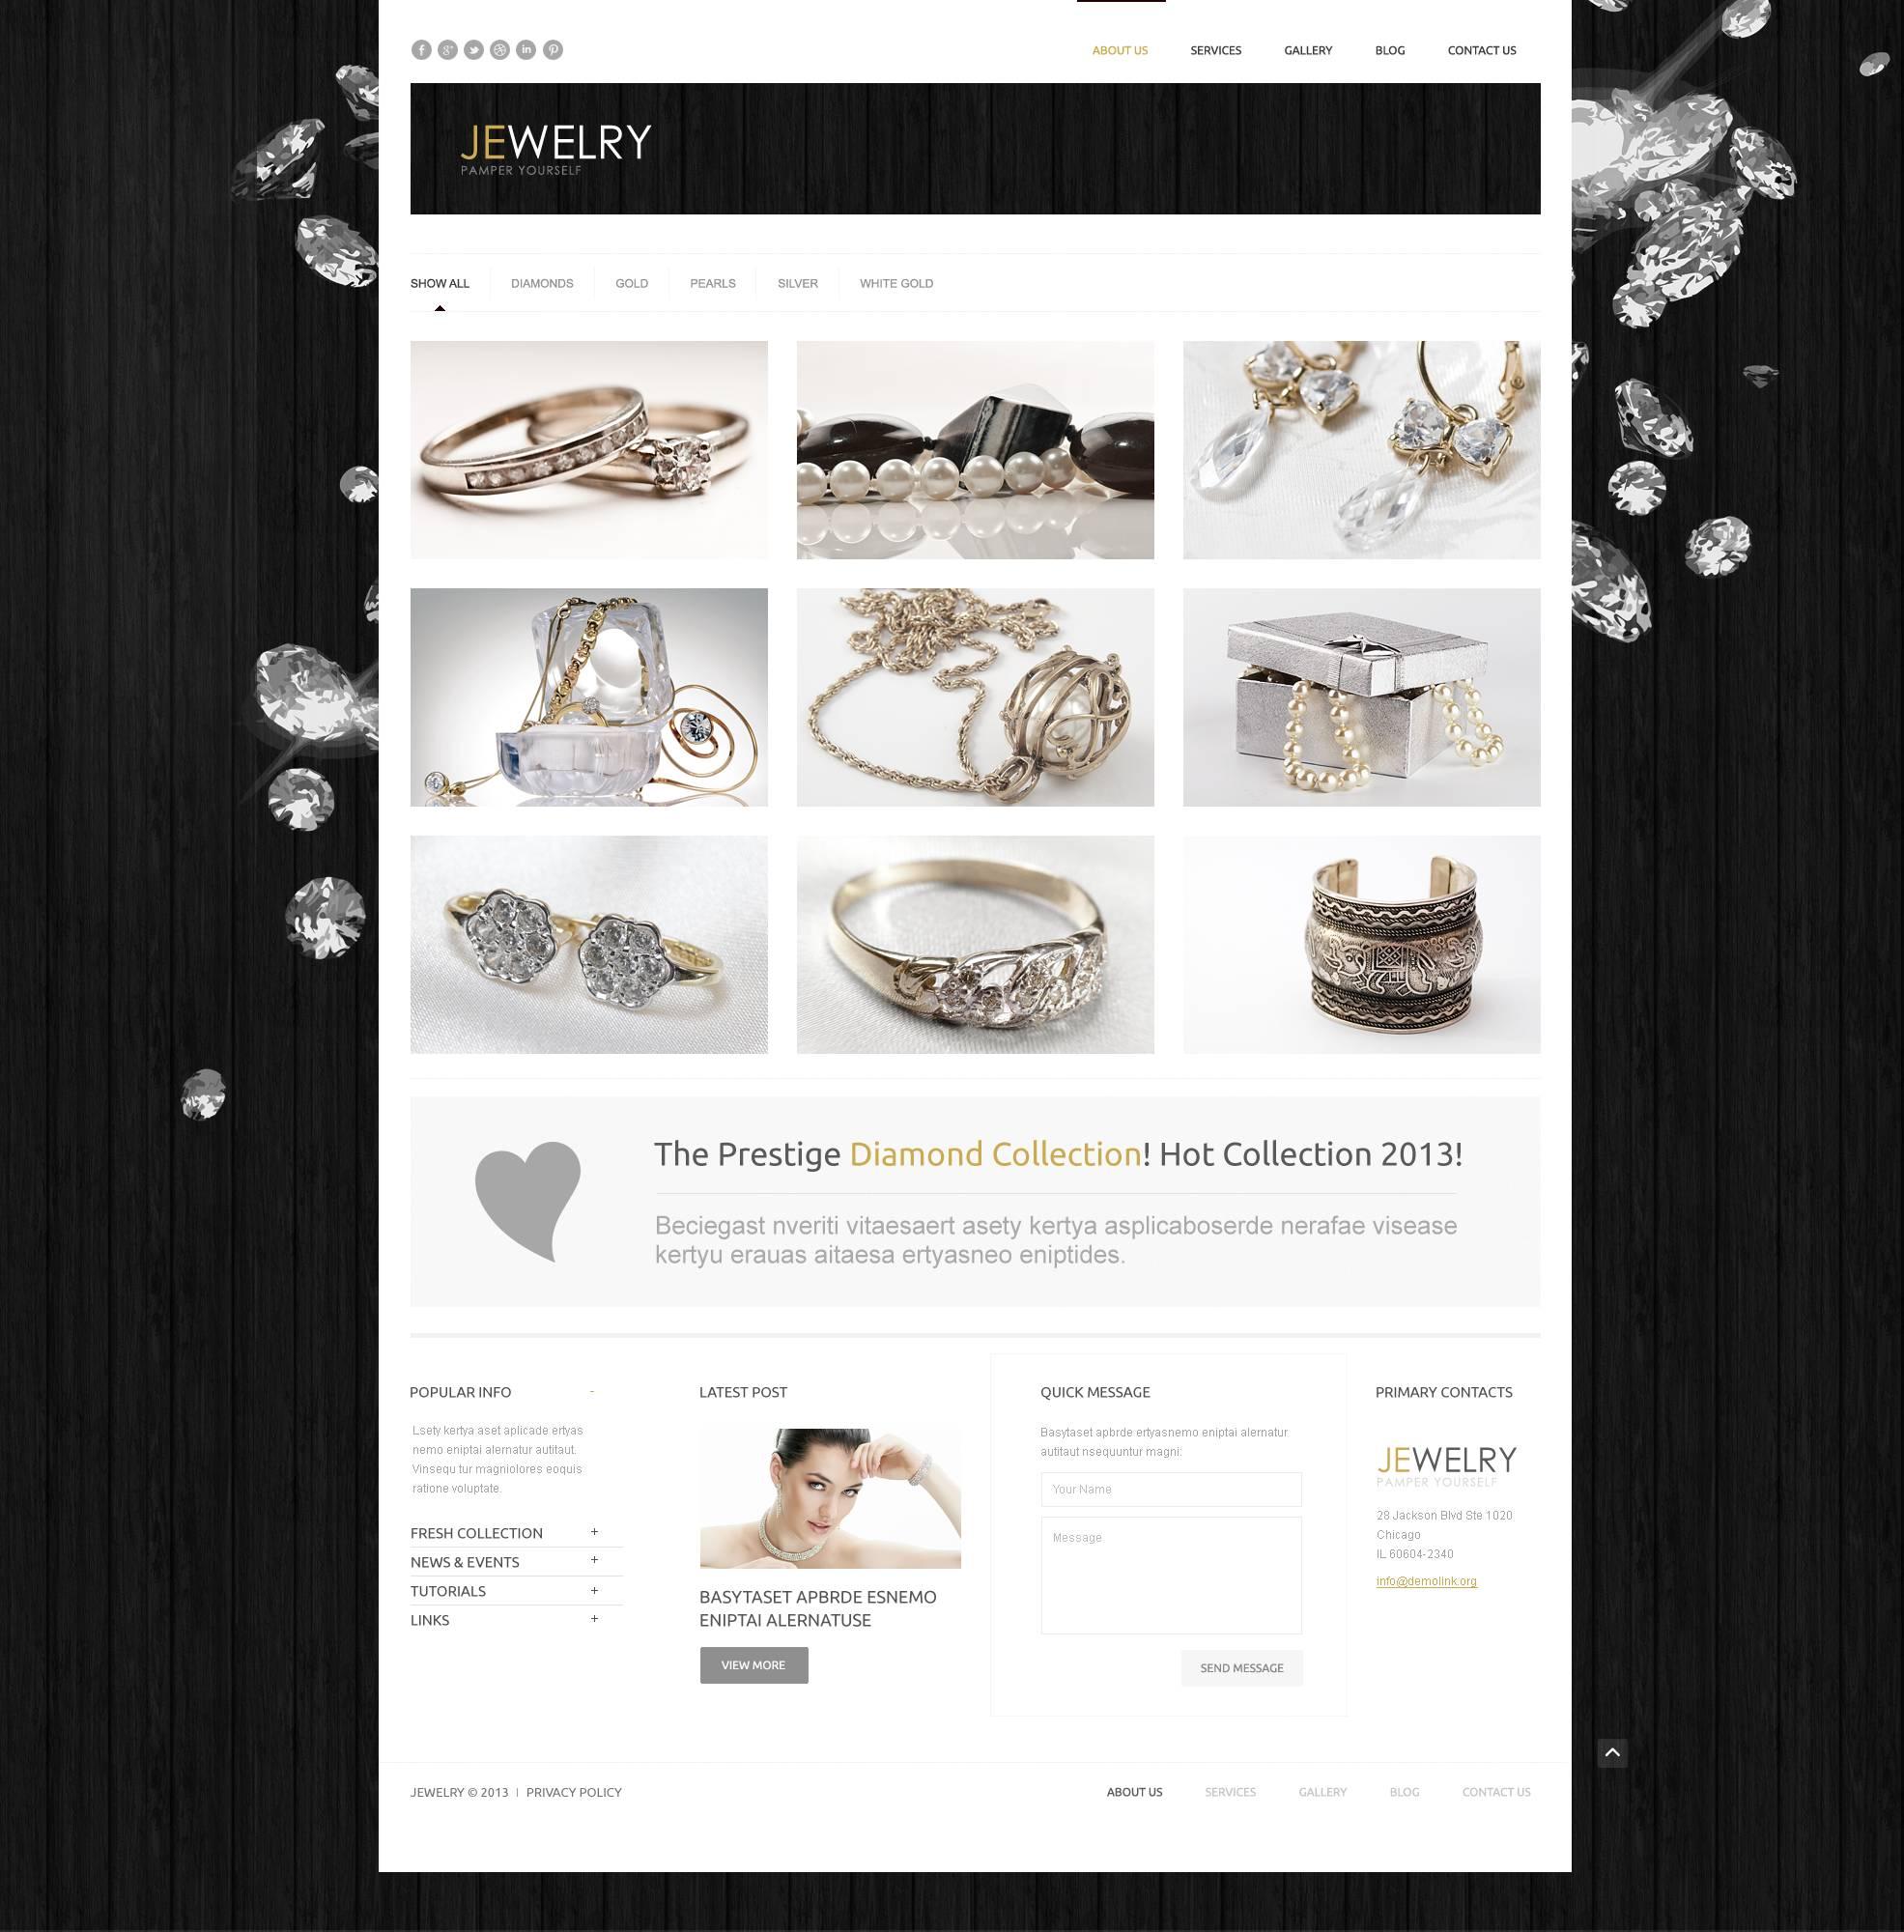 Thème WordPress adaptatif pour site de bijoux #44949 - screenshot